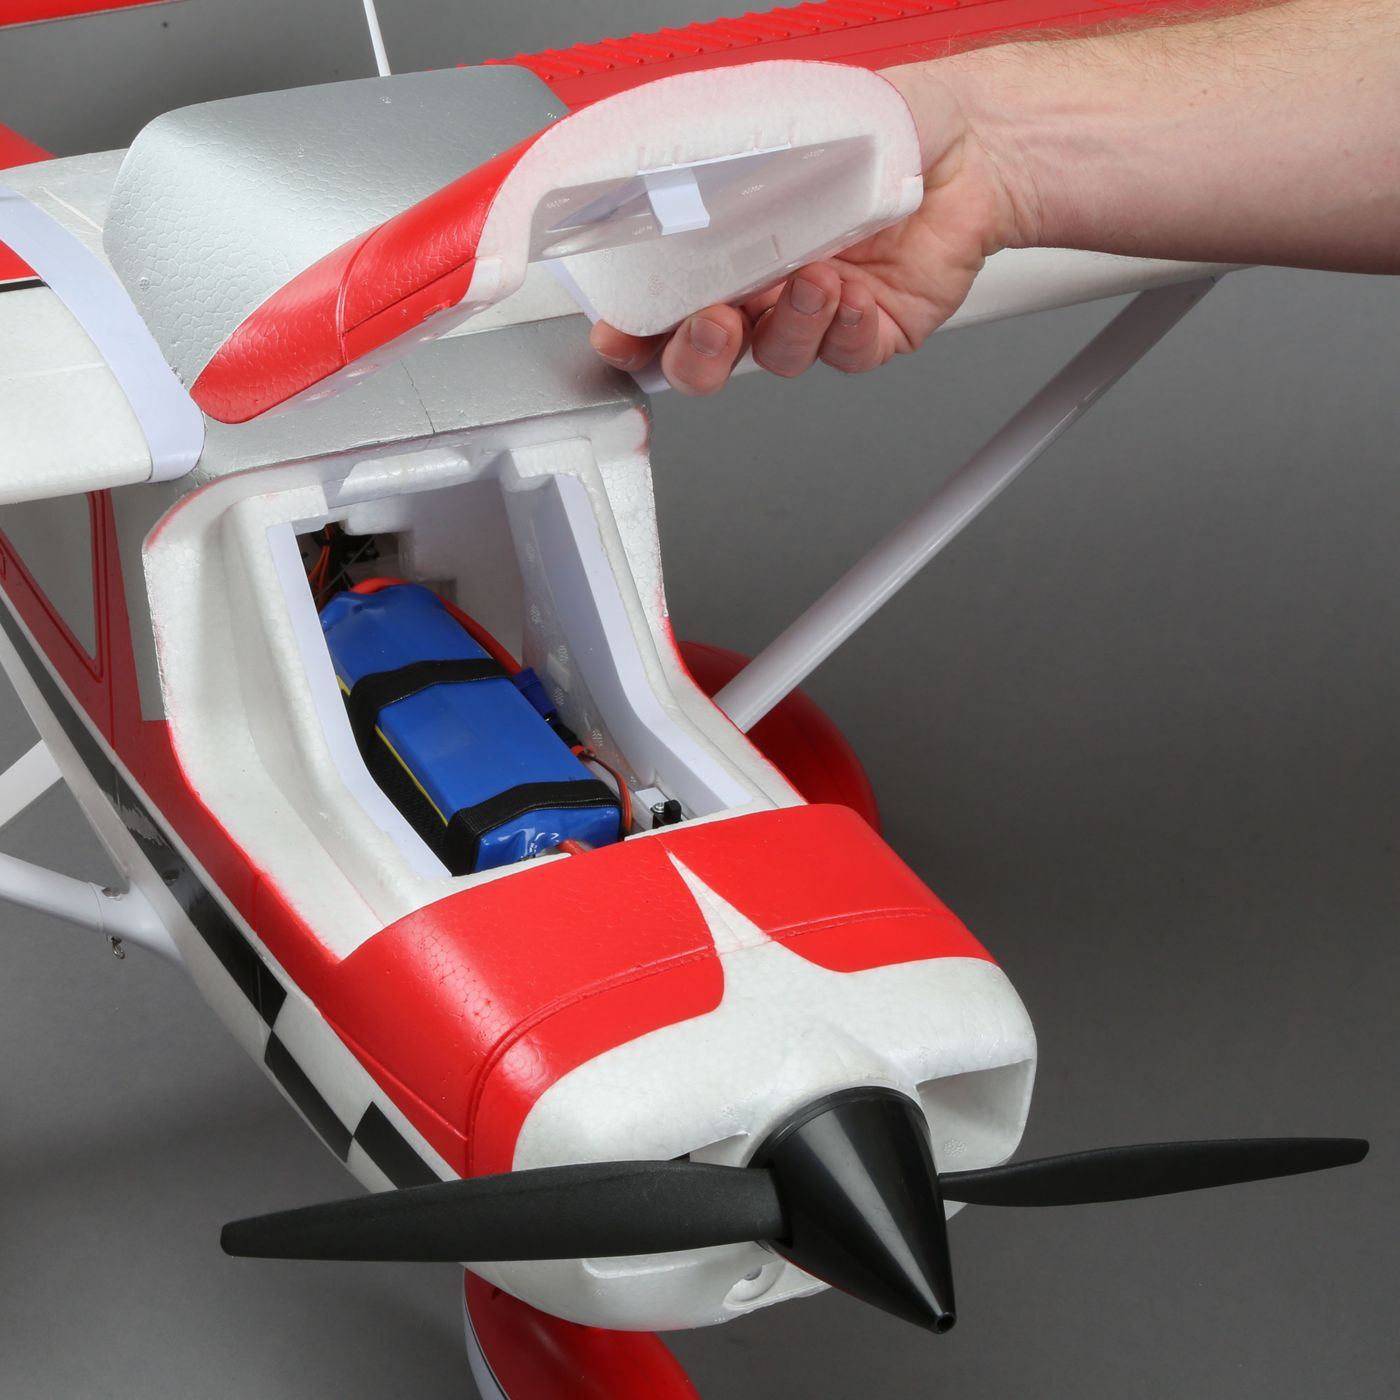 E-flite Carbon Z Cessna 150 2.1m BNF Basic 08